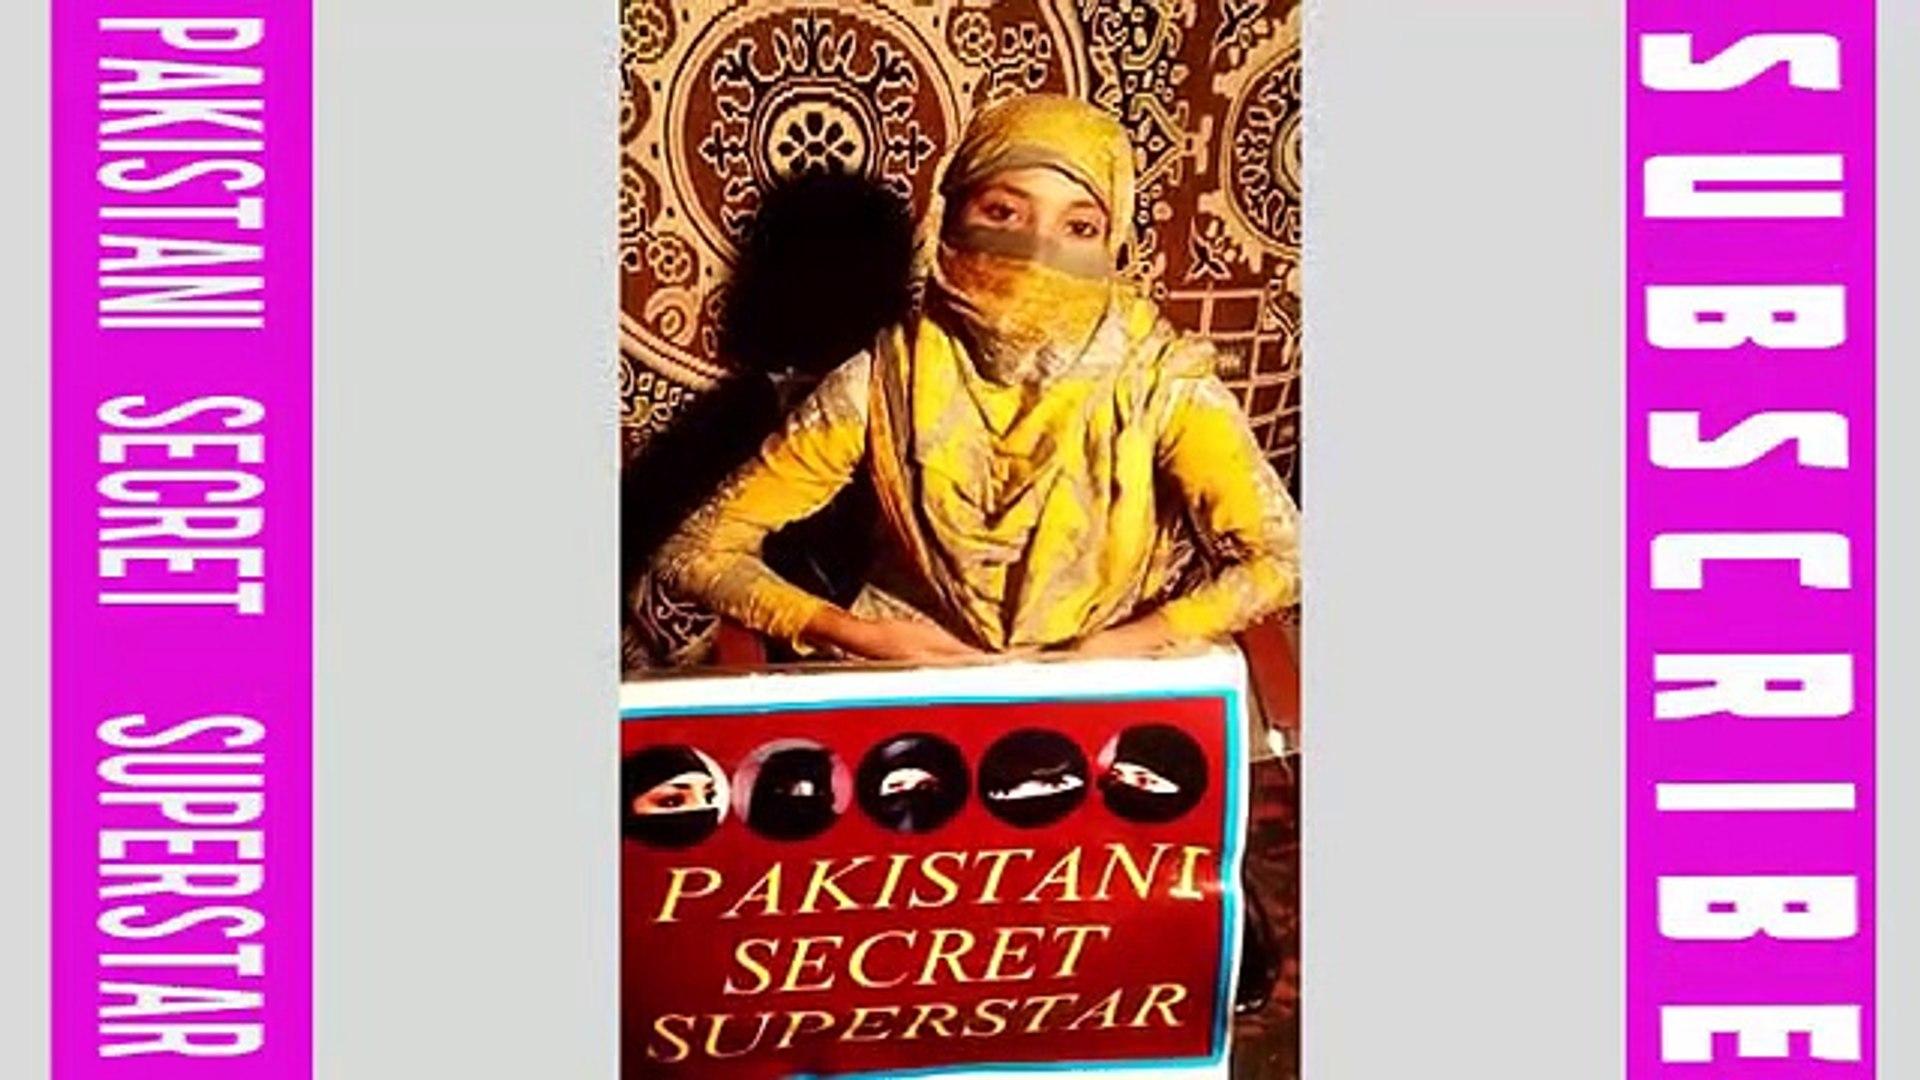 Pakistani Secret Superstar Reacts    Car Mein Music Baja    Neha Kakkar    Tony Kakkar    Dance Intr